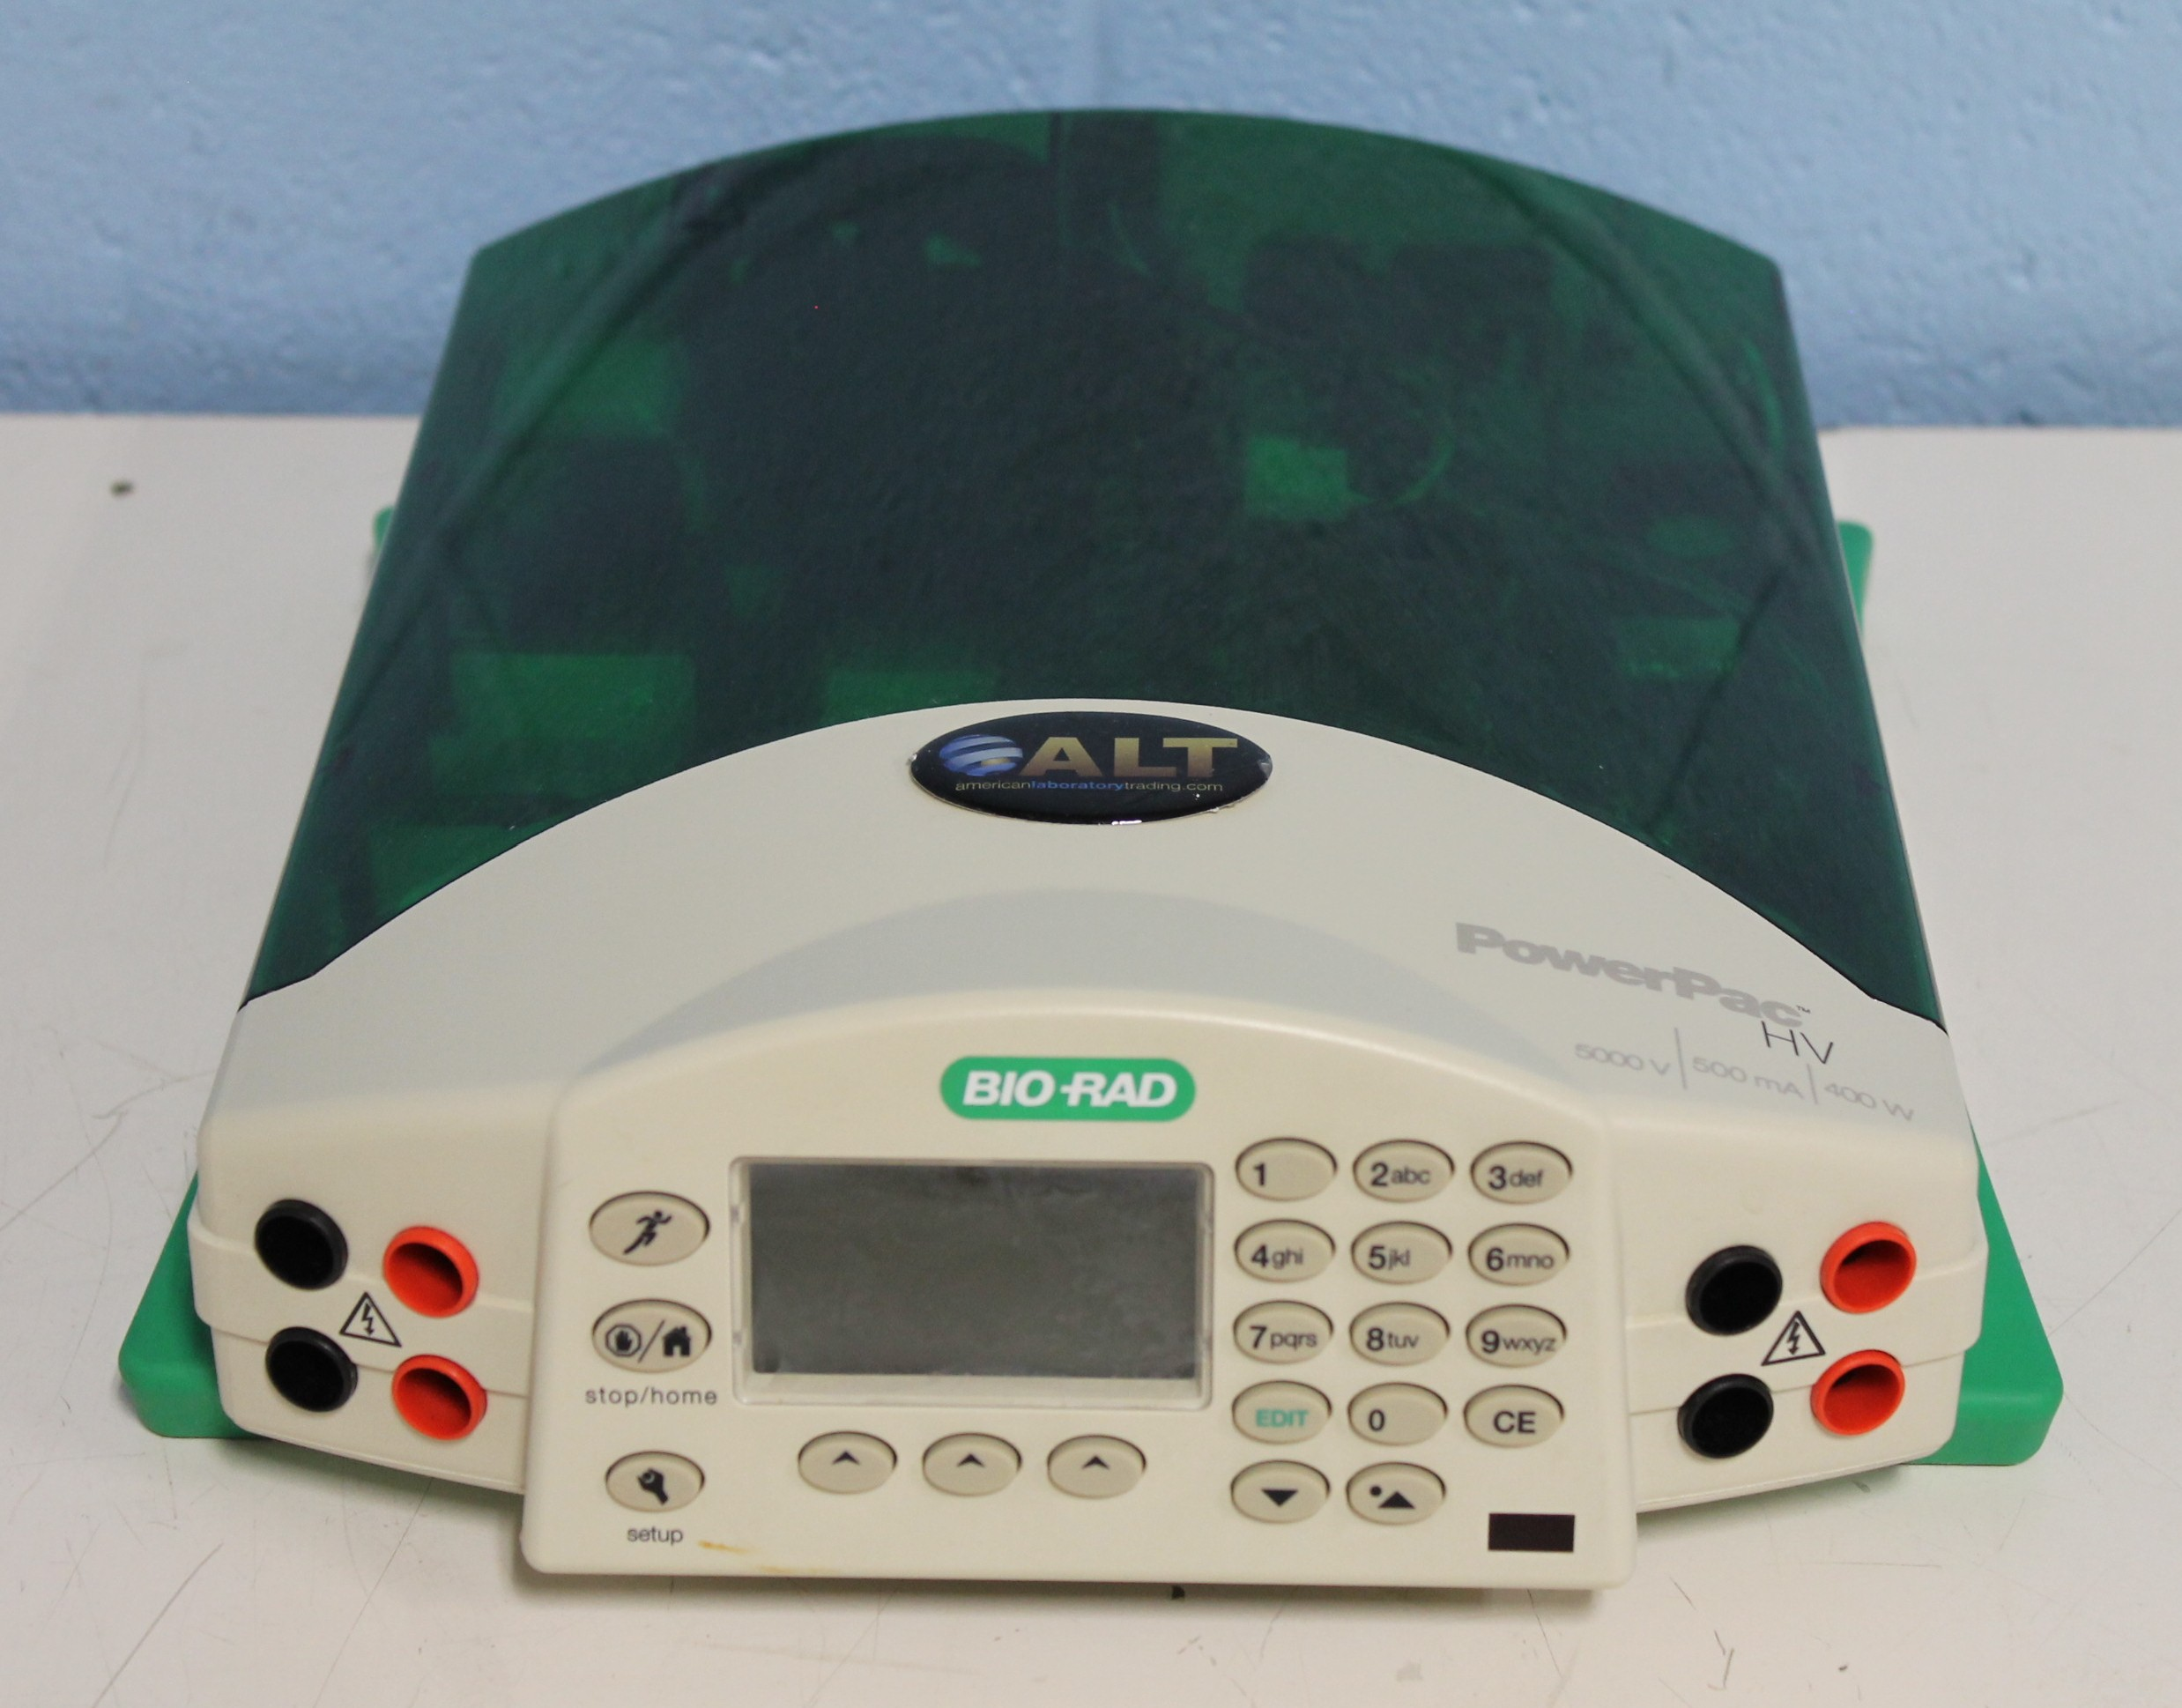 Bio-Rad PowerPac HV Power Supply Image